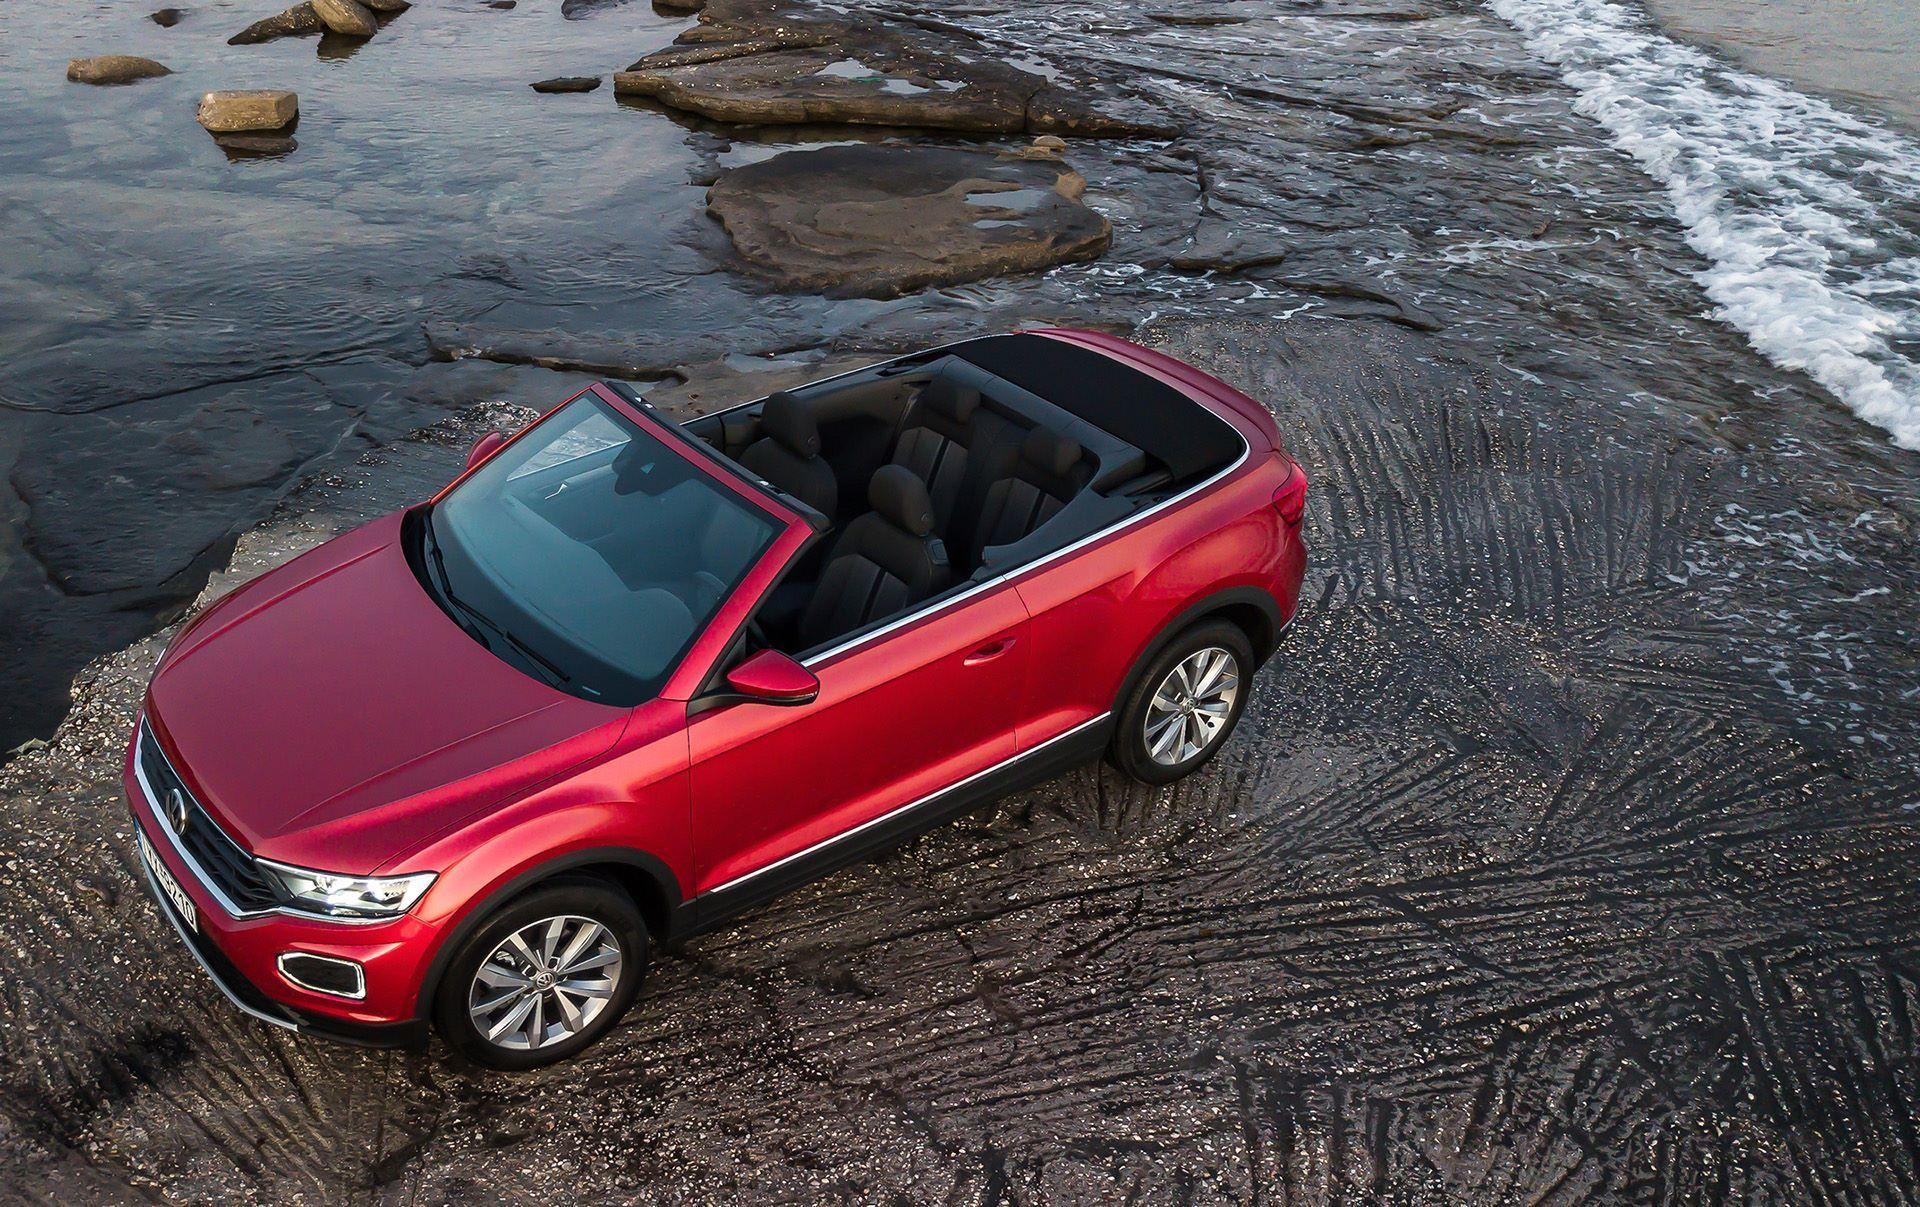 Volkswagen-T-Roc-Cabriolet-Greece-3